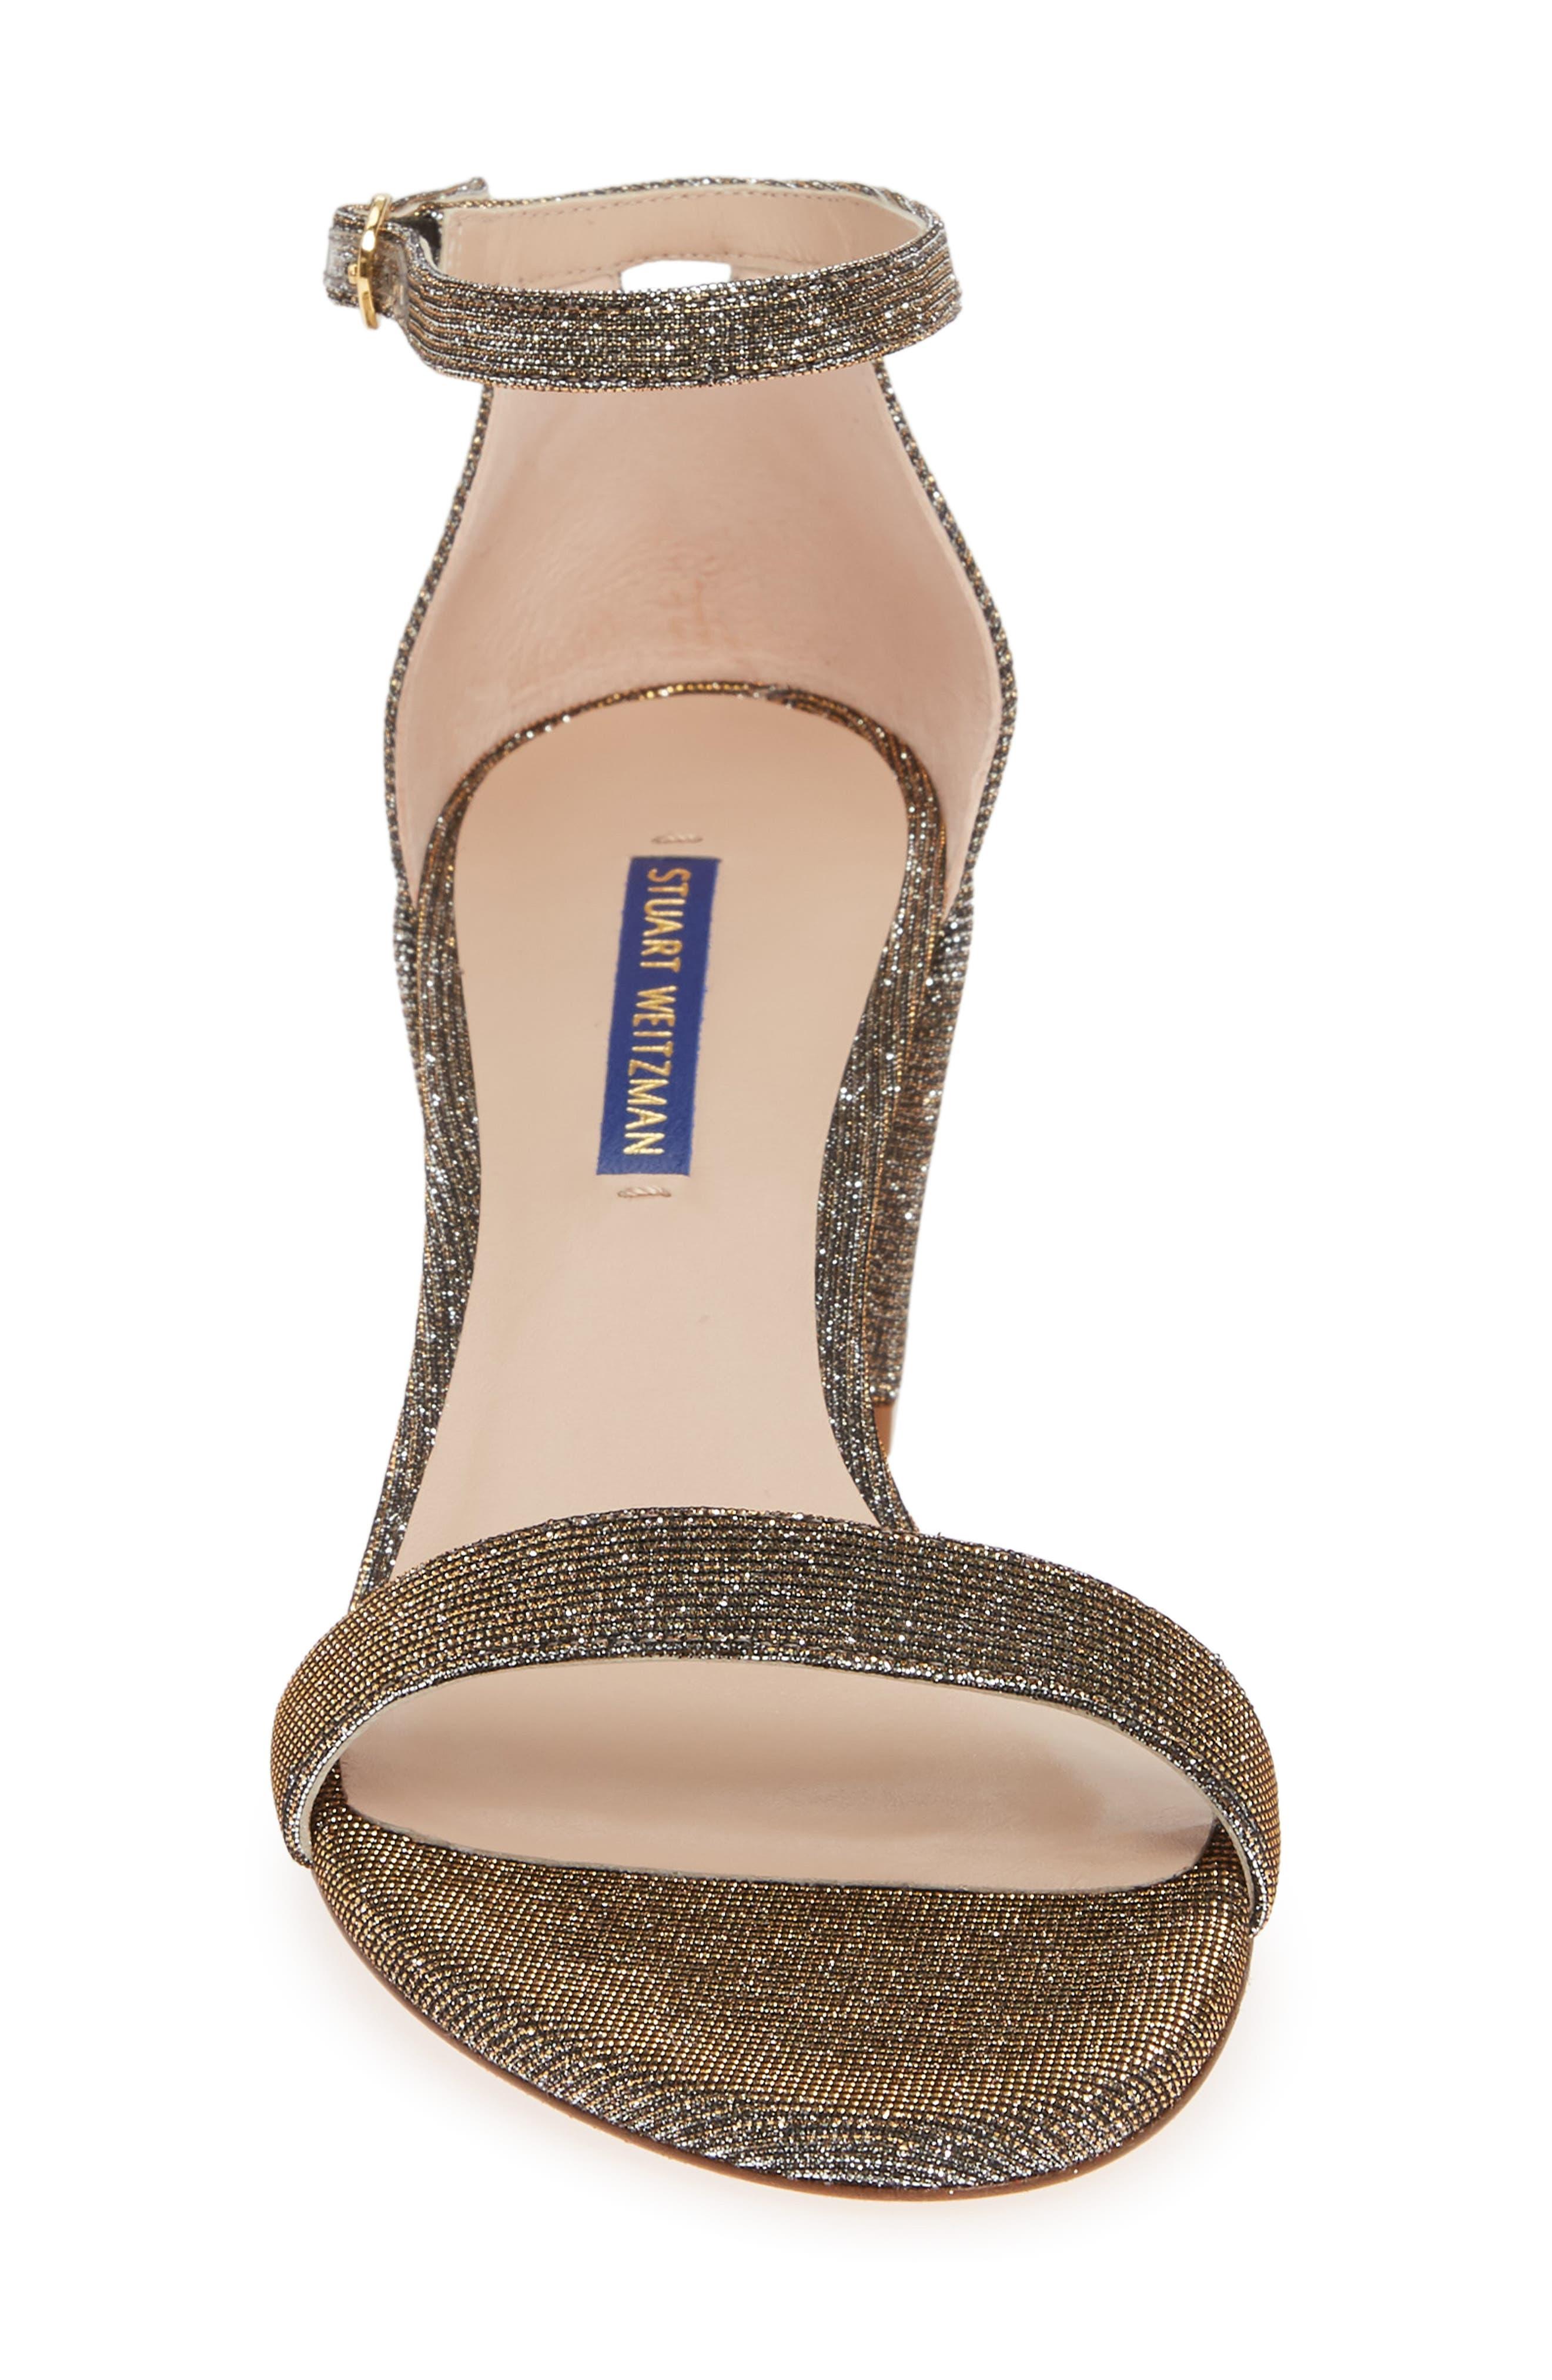 STUART WEITZMAN, Simple Ankle Strap Sandal, Alternate thumbnail 4, color, GOLD NIGHTTIME